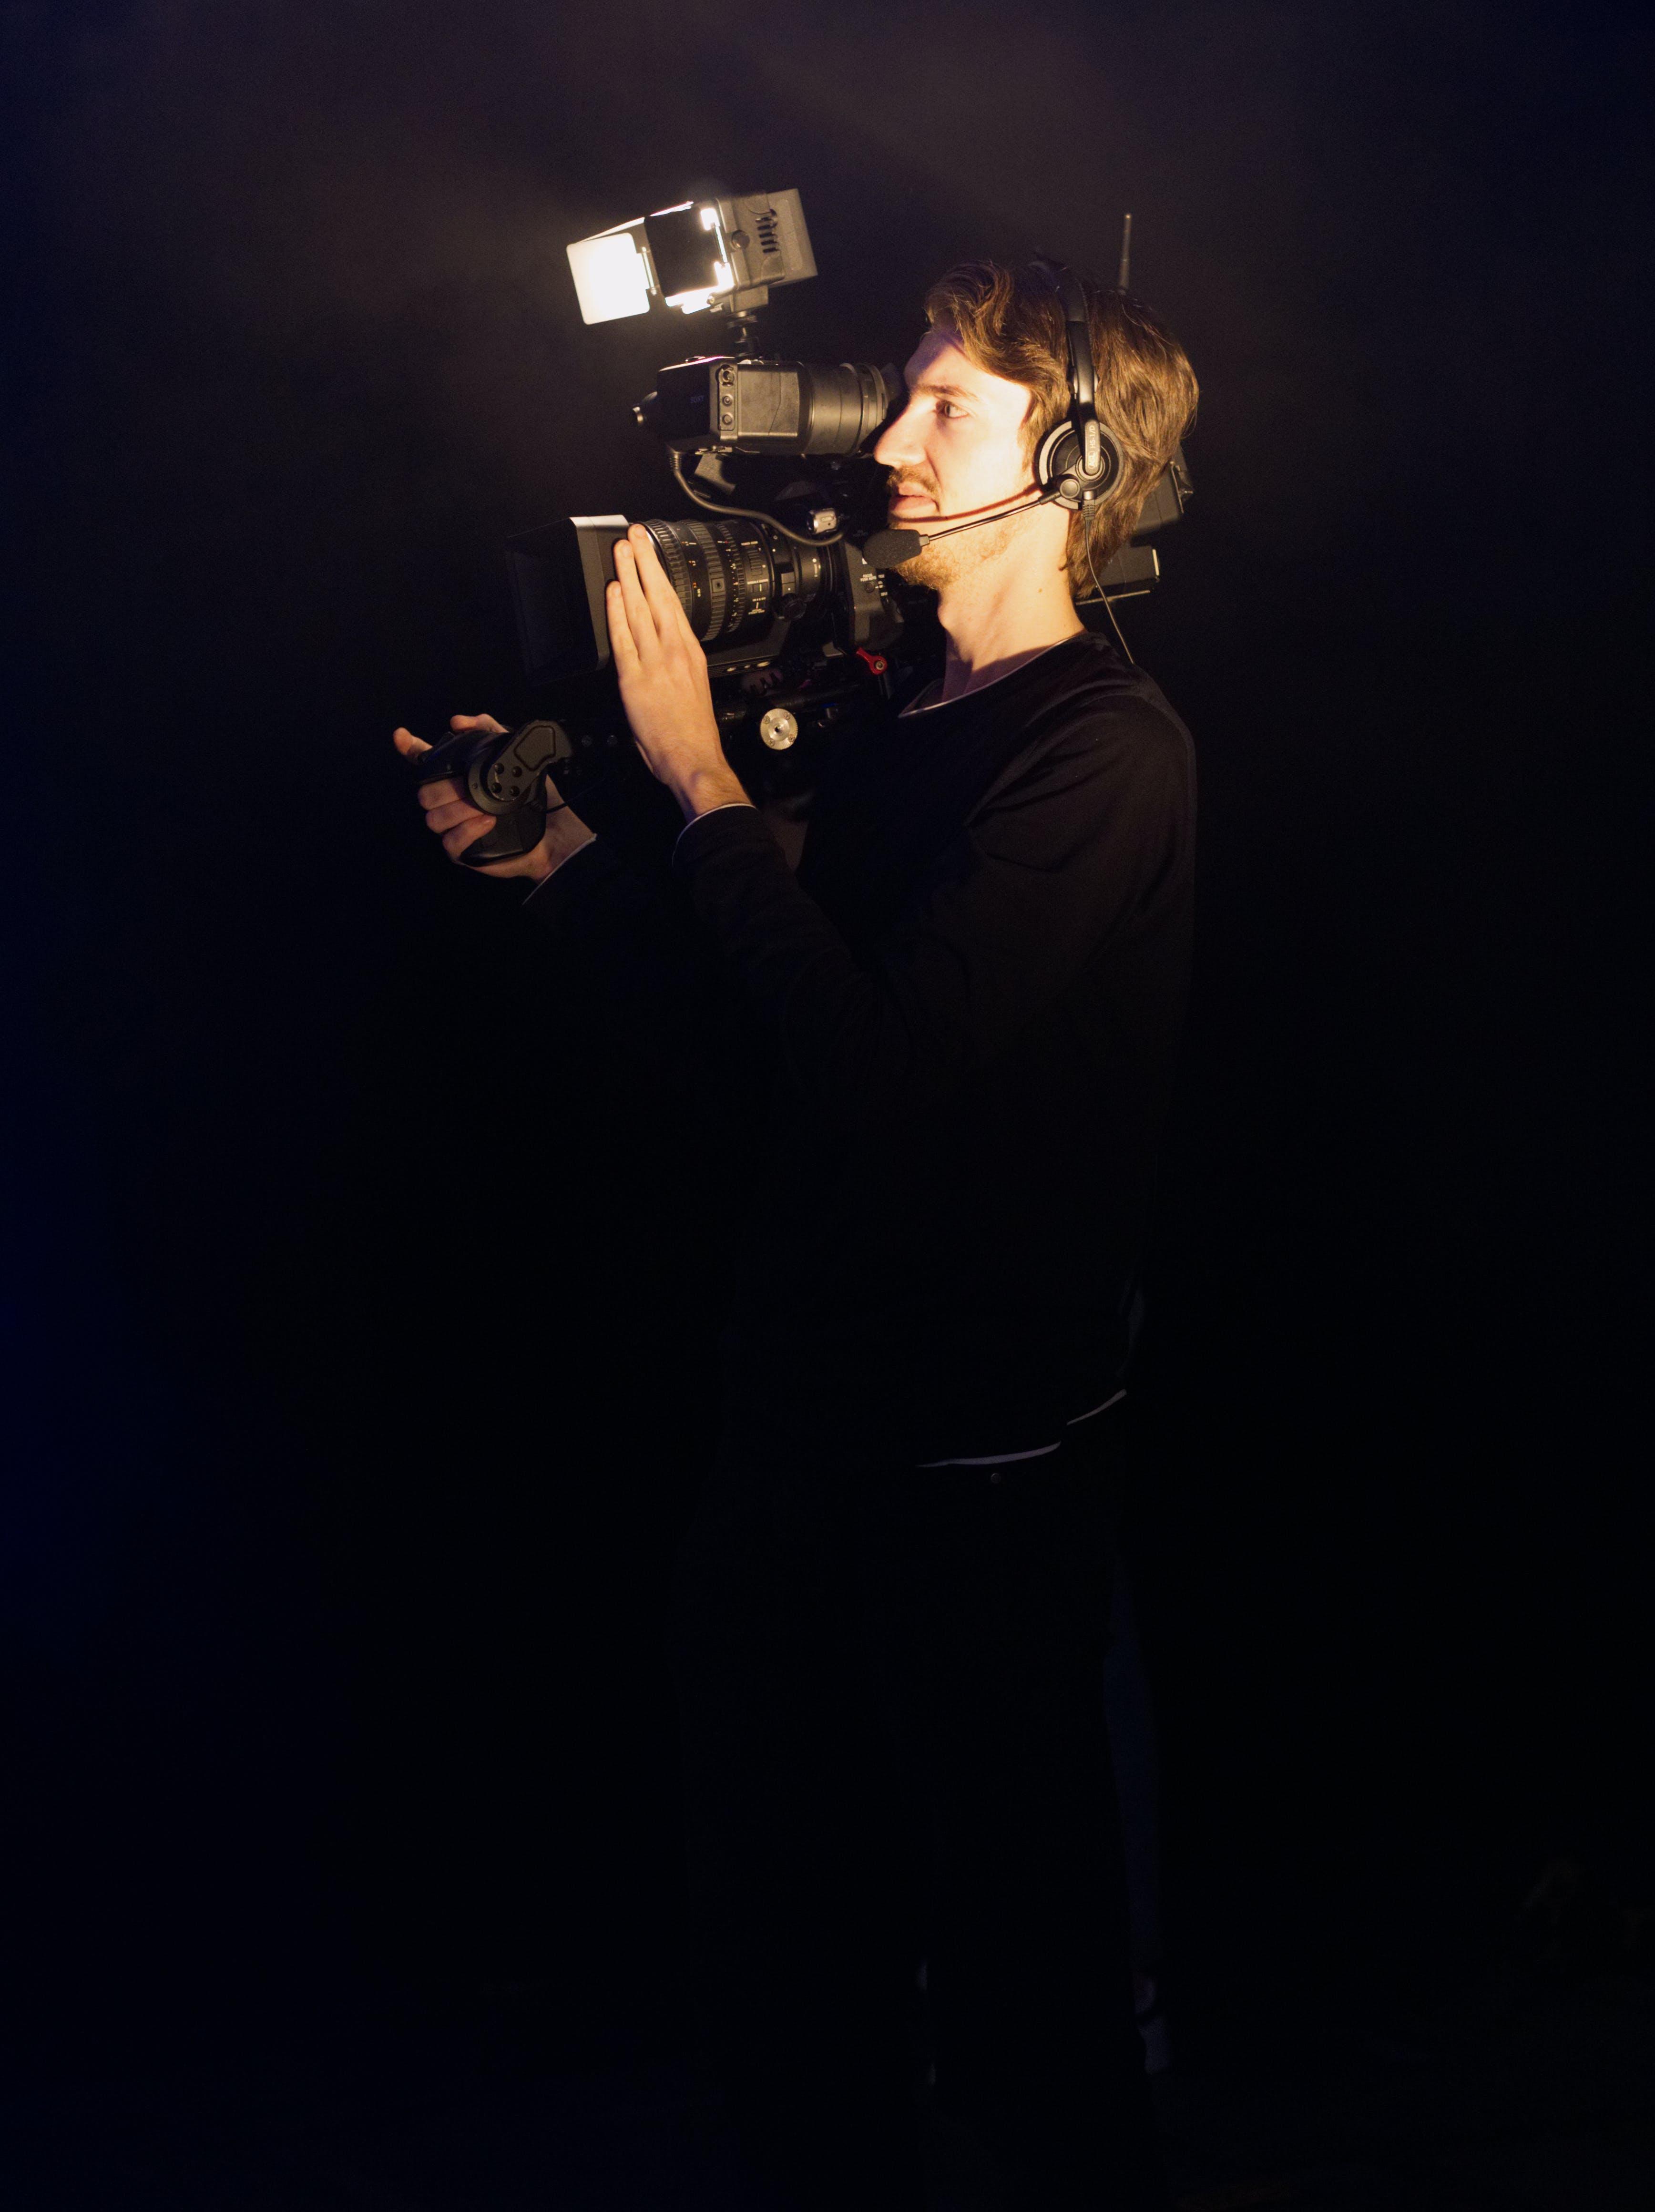 Man Wearing Black Long-sleeved Shirt Using Video Camera